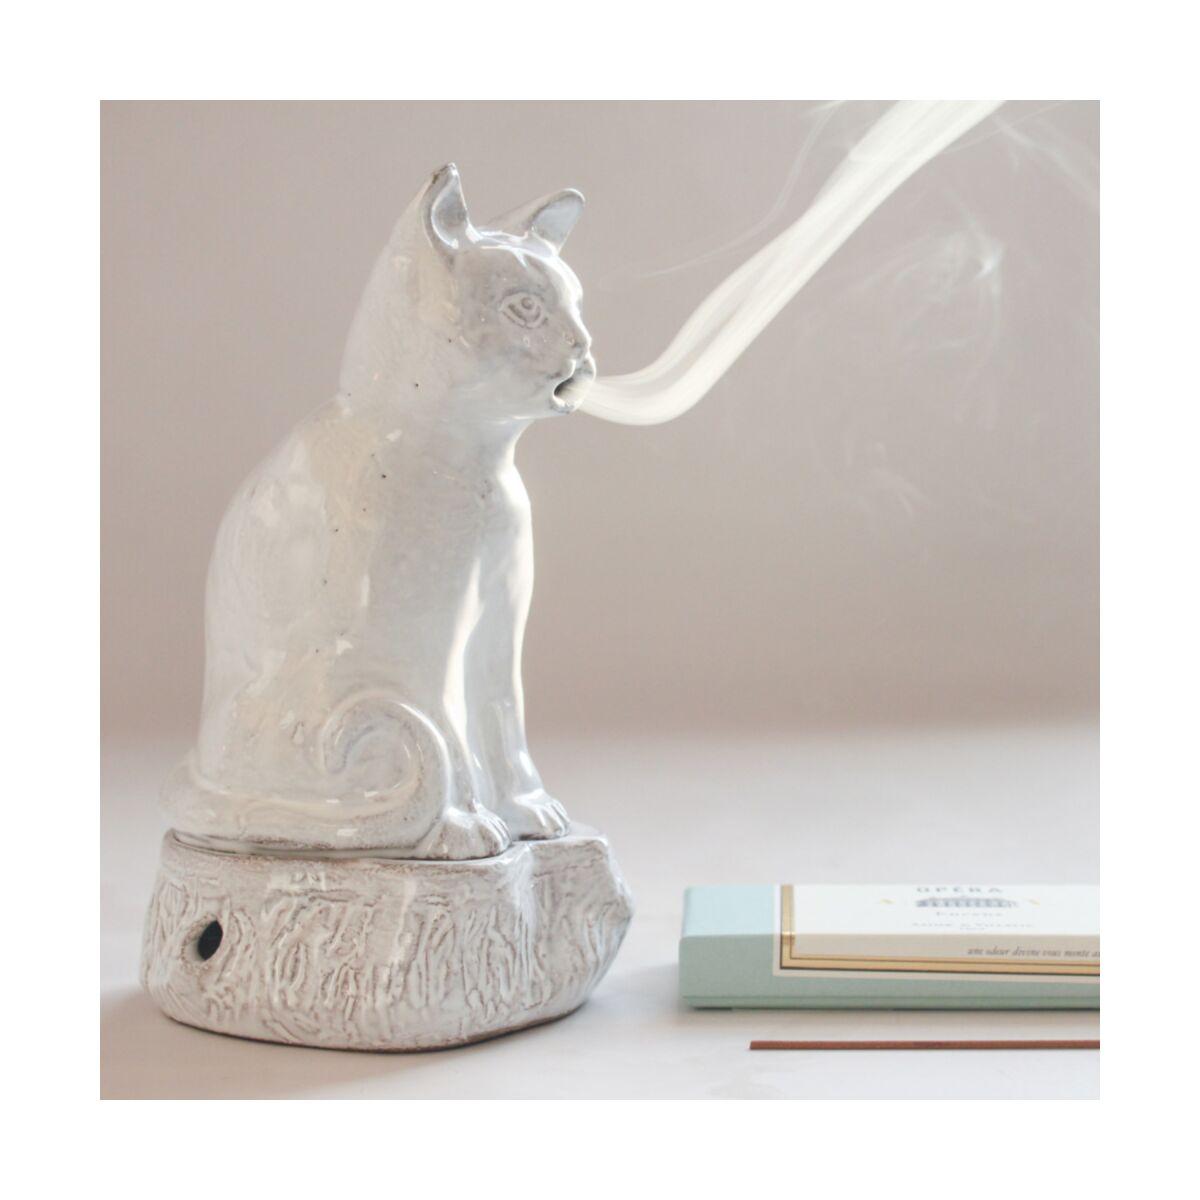 Setsuko Cat Incense Burner Astier de Villatte, $320 @catbirdnyc.com